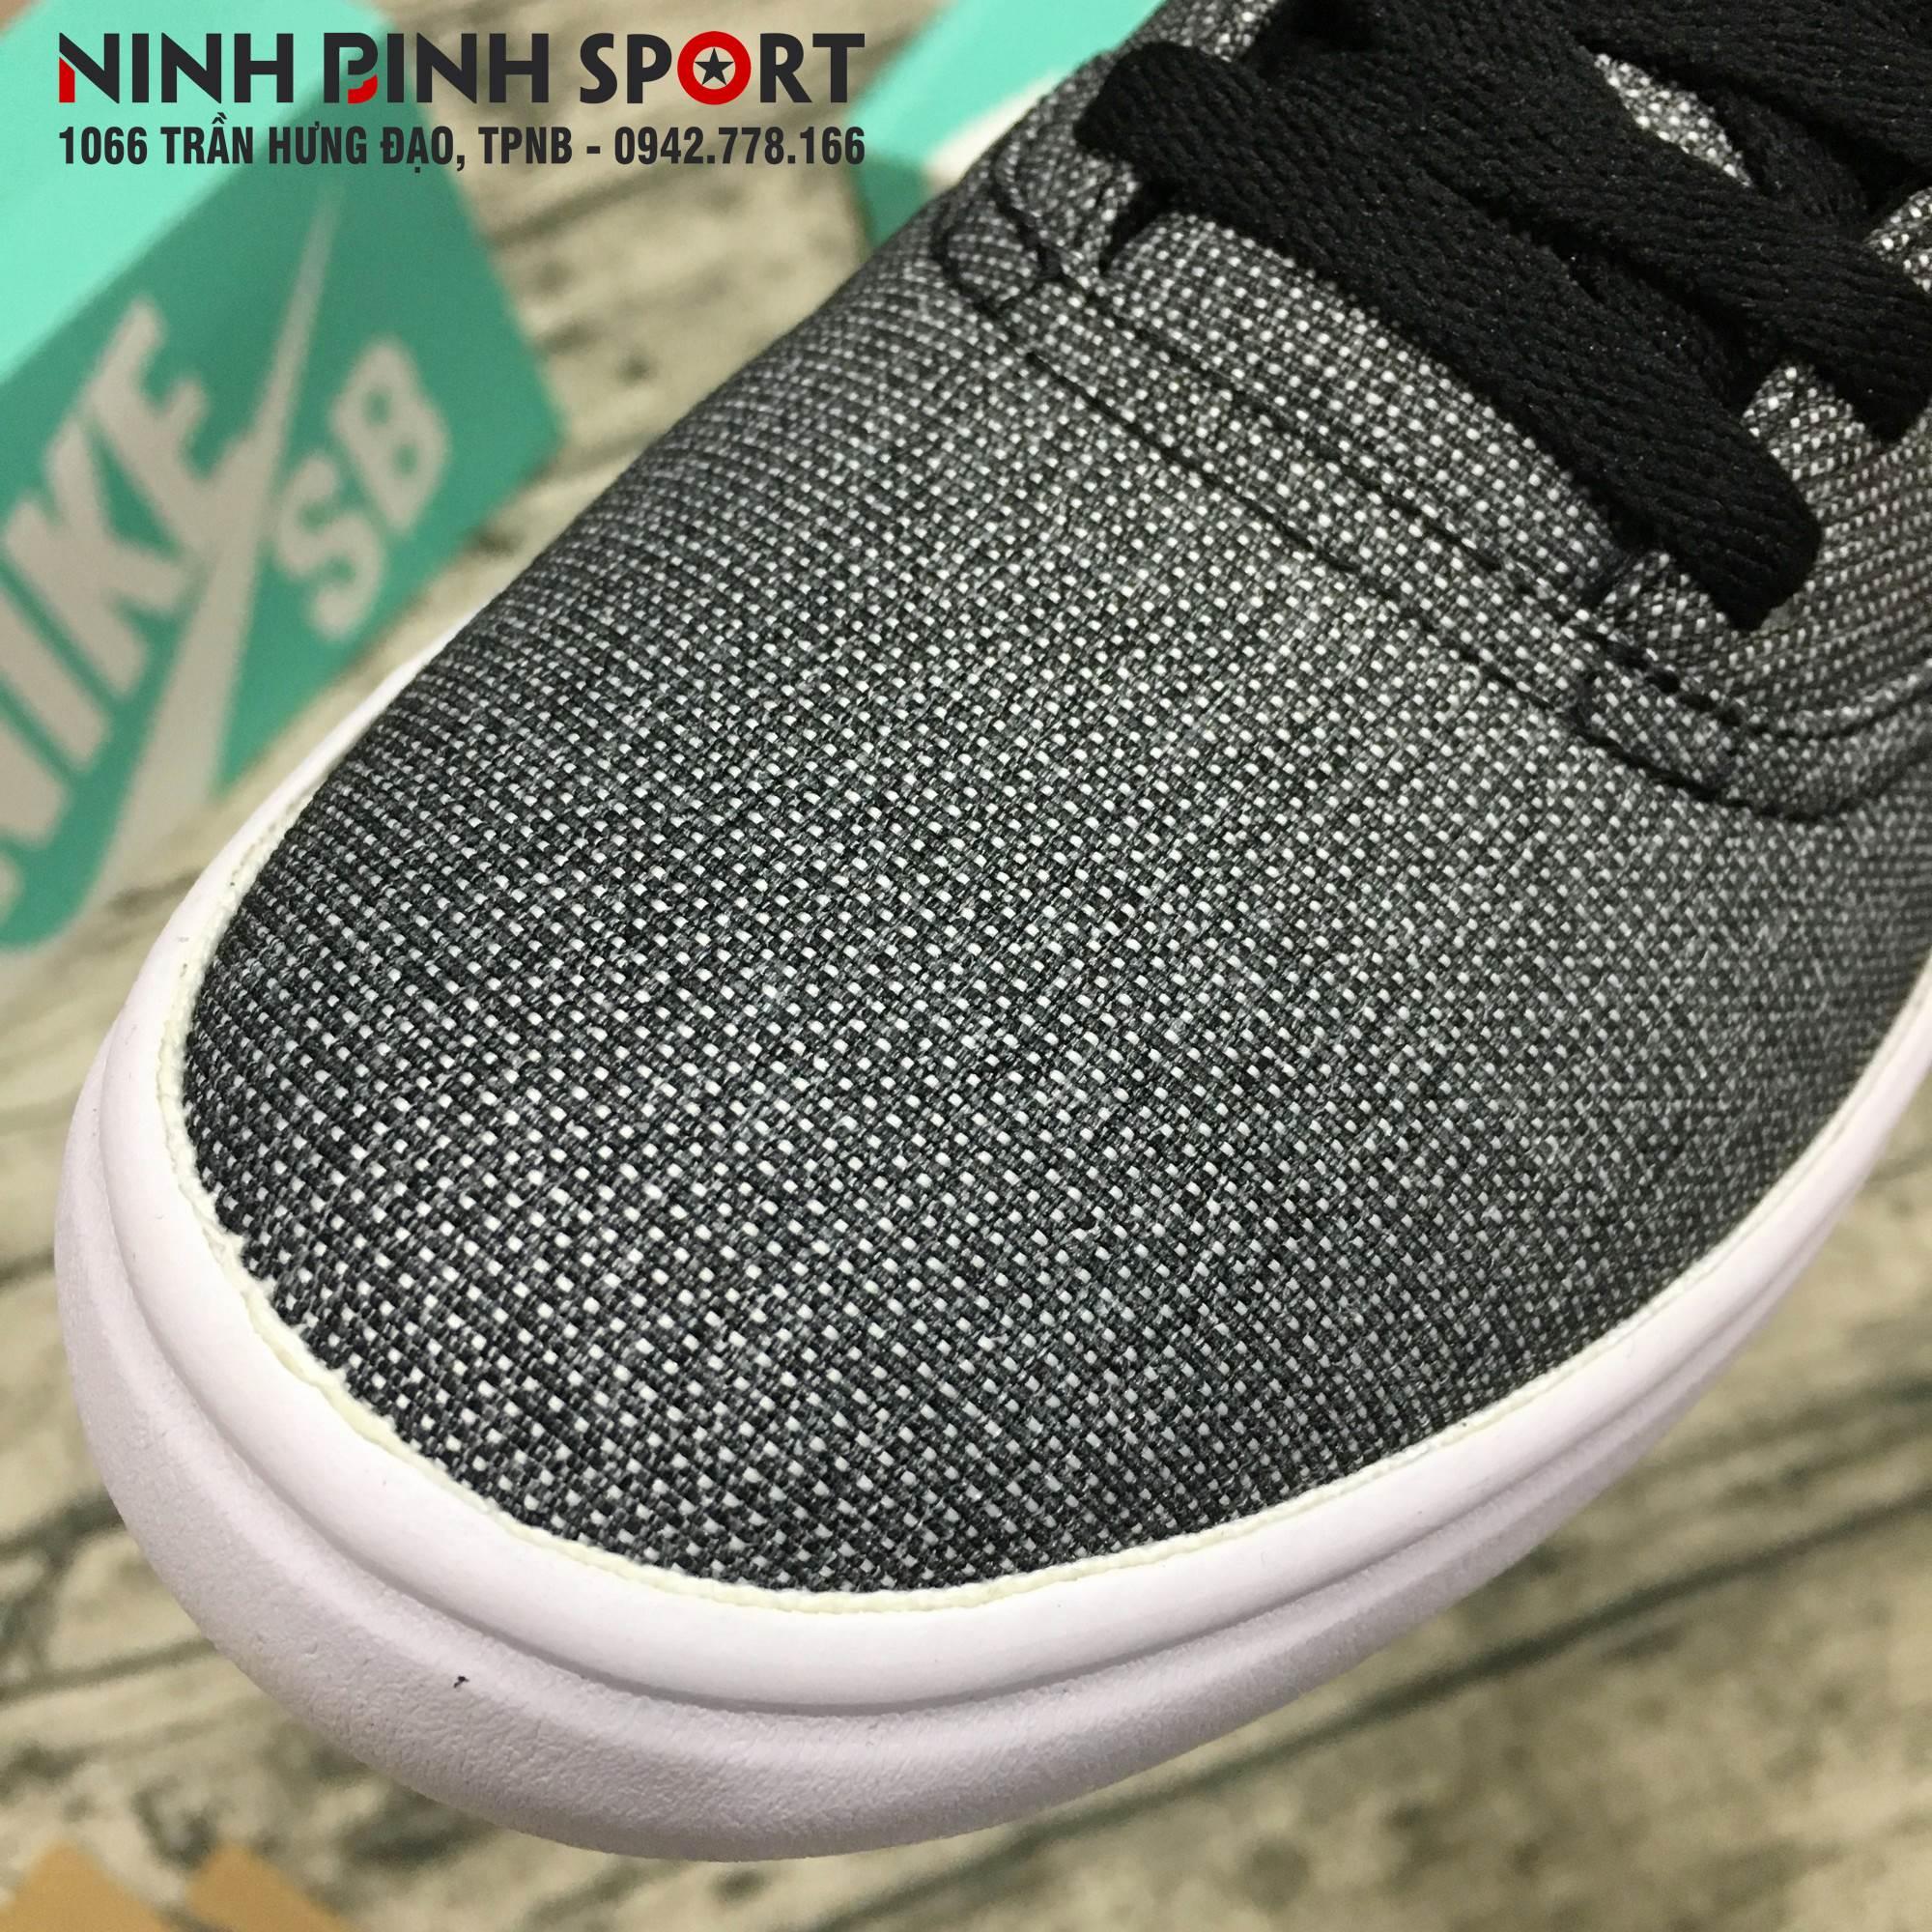 Giầy thể thao nam Nike SB Check 843896-004